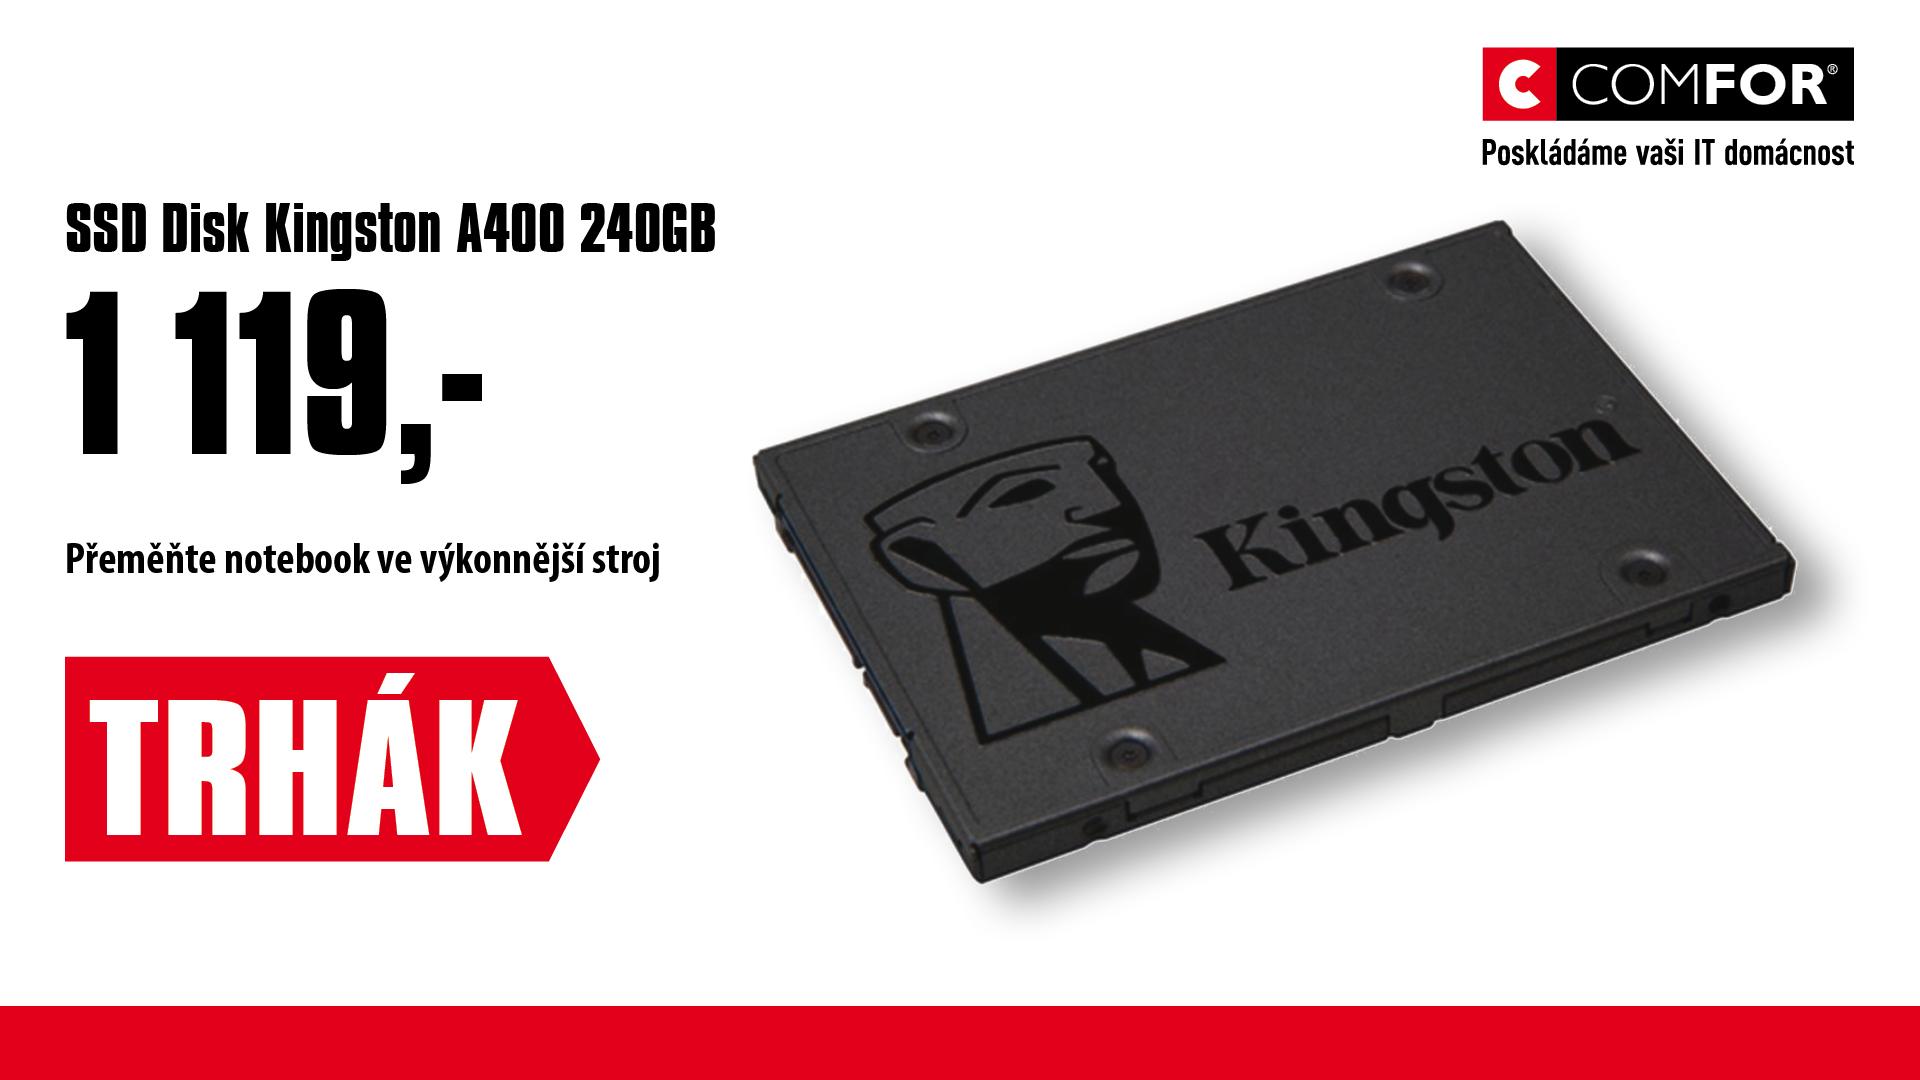 240GB A400 Kingston SATA3 2.5 500/350MBs